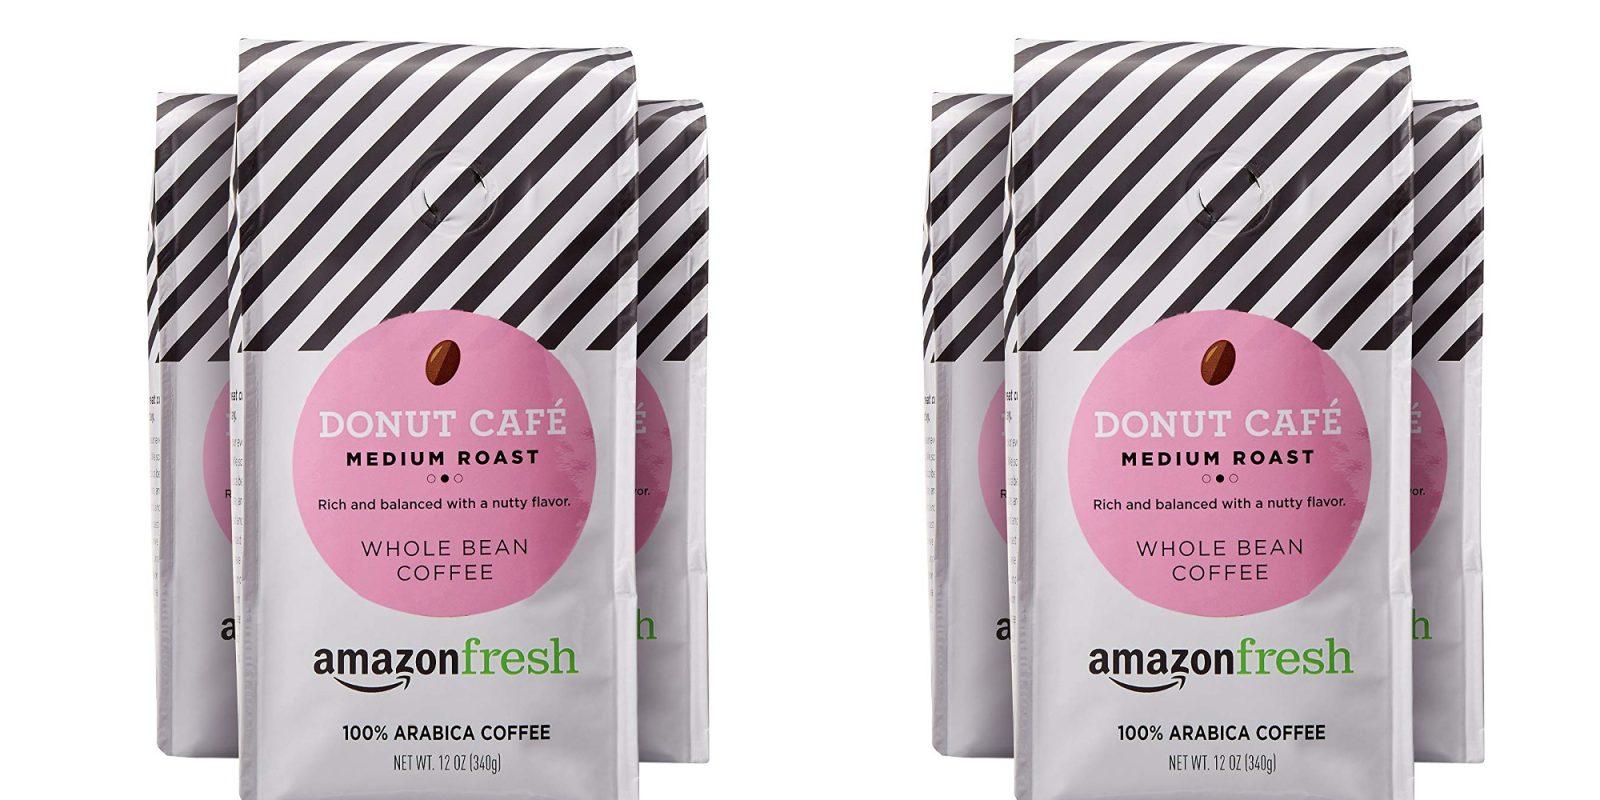 AmazonFresh Donut Cafe Whole Bean Coffee: 3-pack for under $10 (Reg. $18)